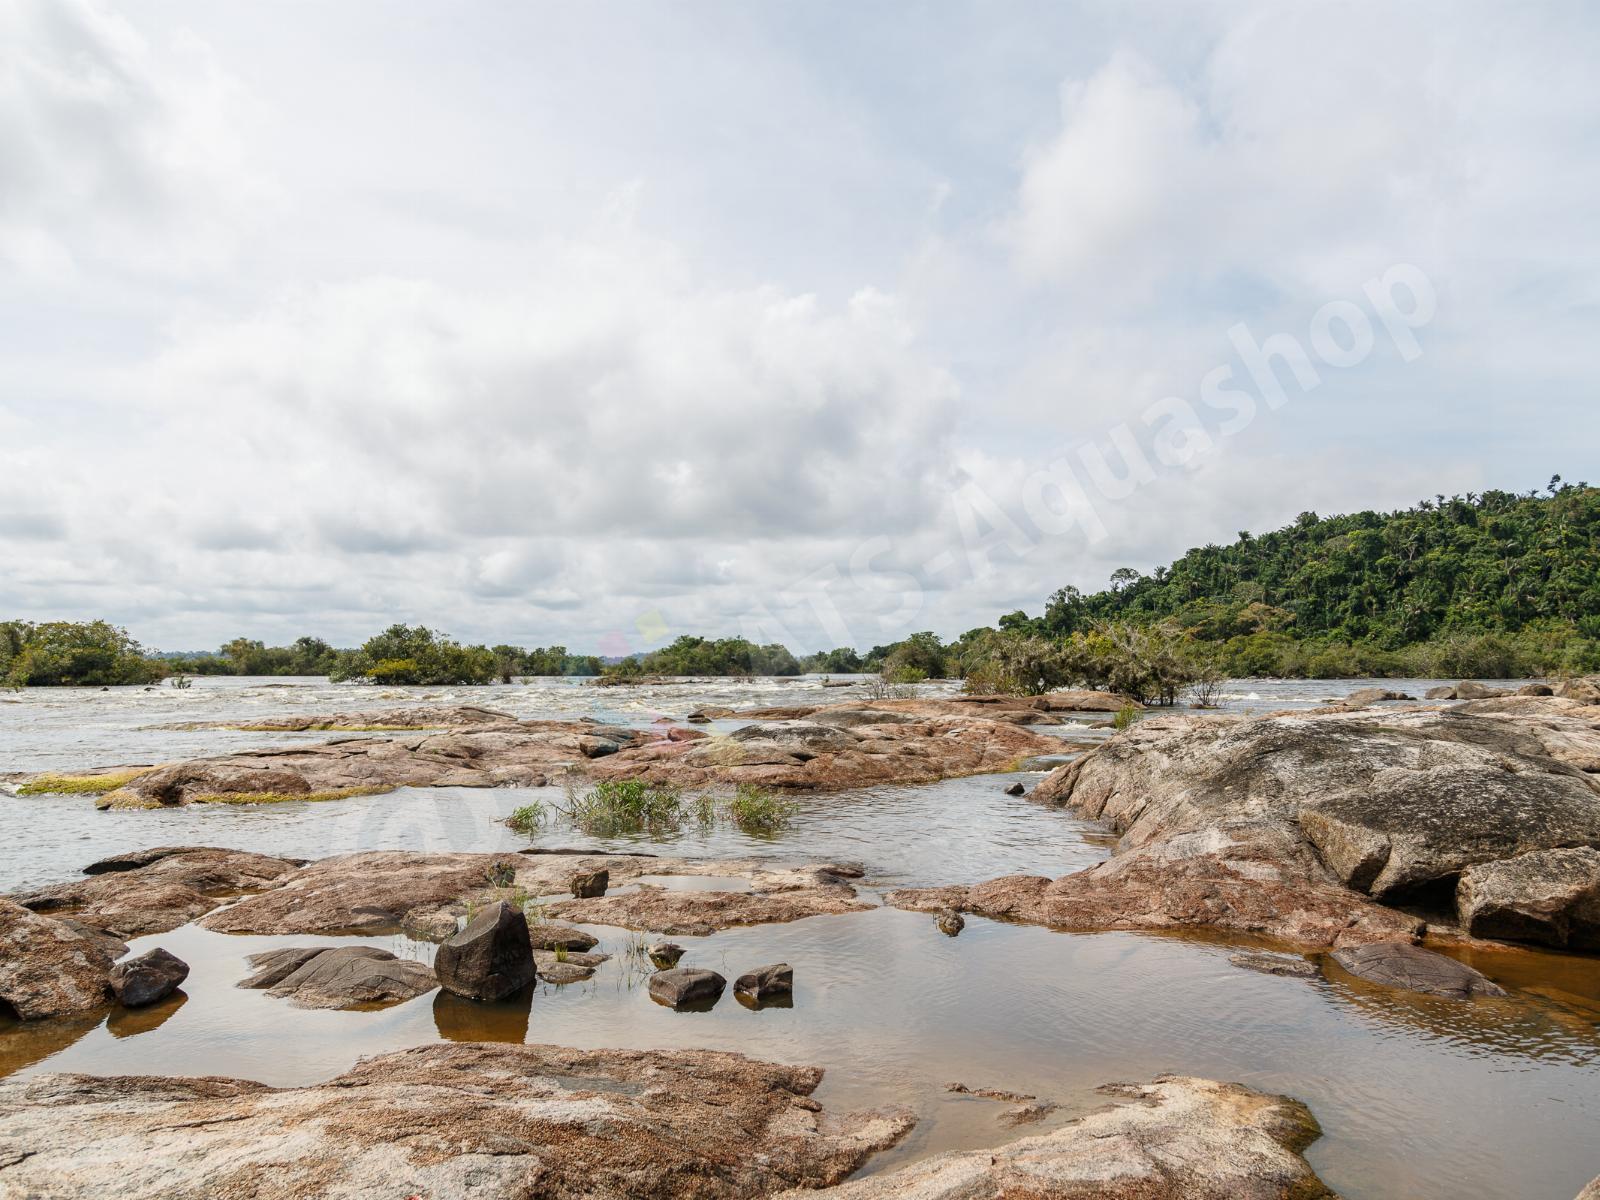 rio xingu cachoeira do jericoa andreas tanke 0195 6